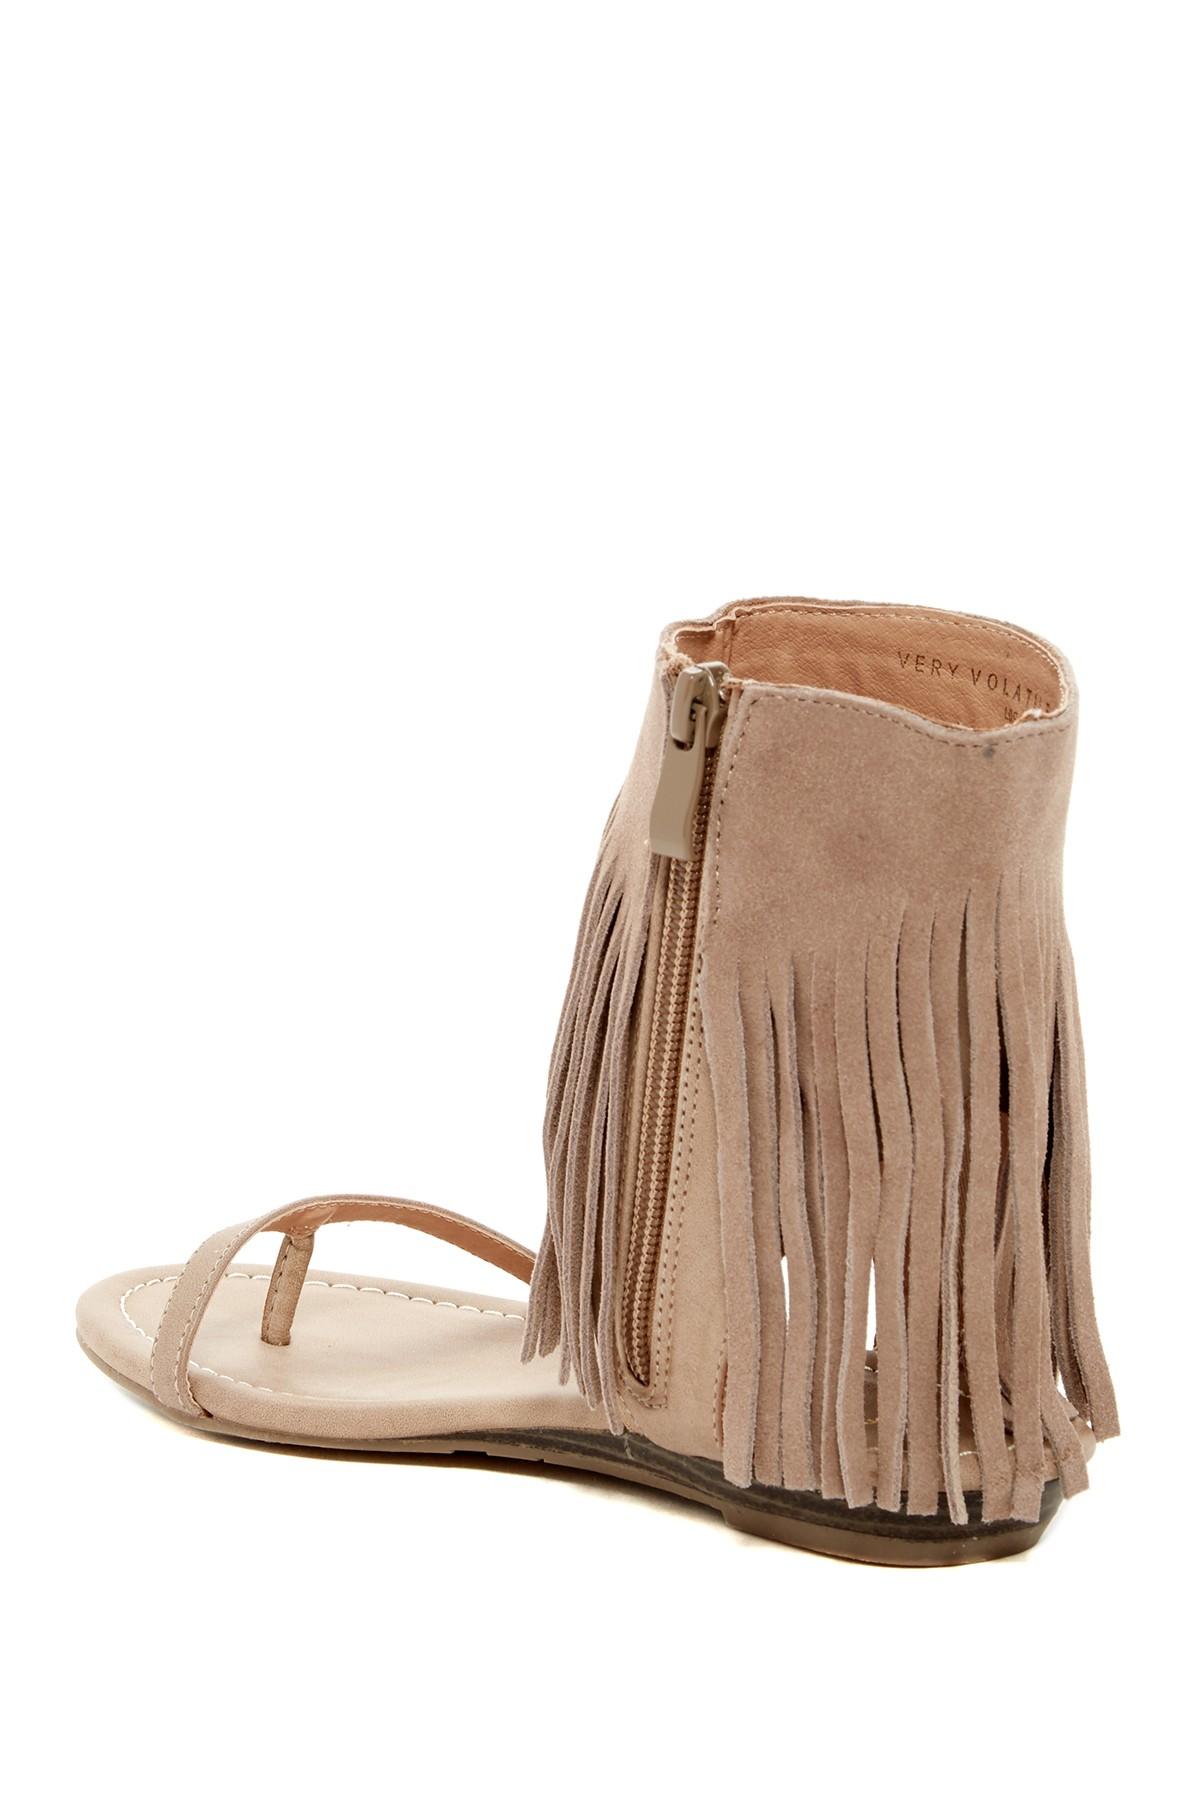 Lyst Very Volatile Sweet Fringe Sandal In Brown